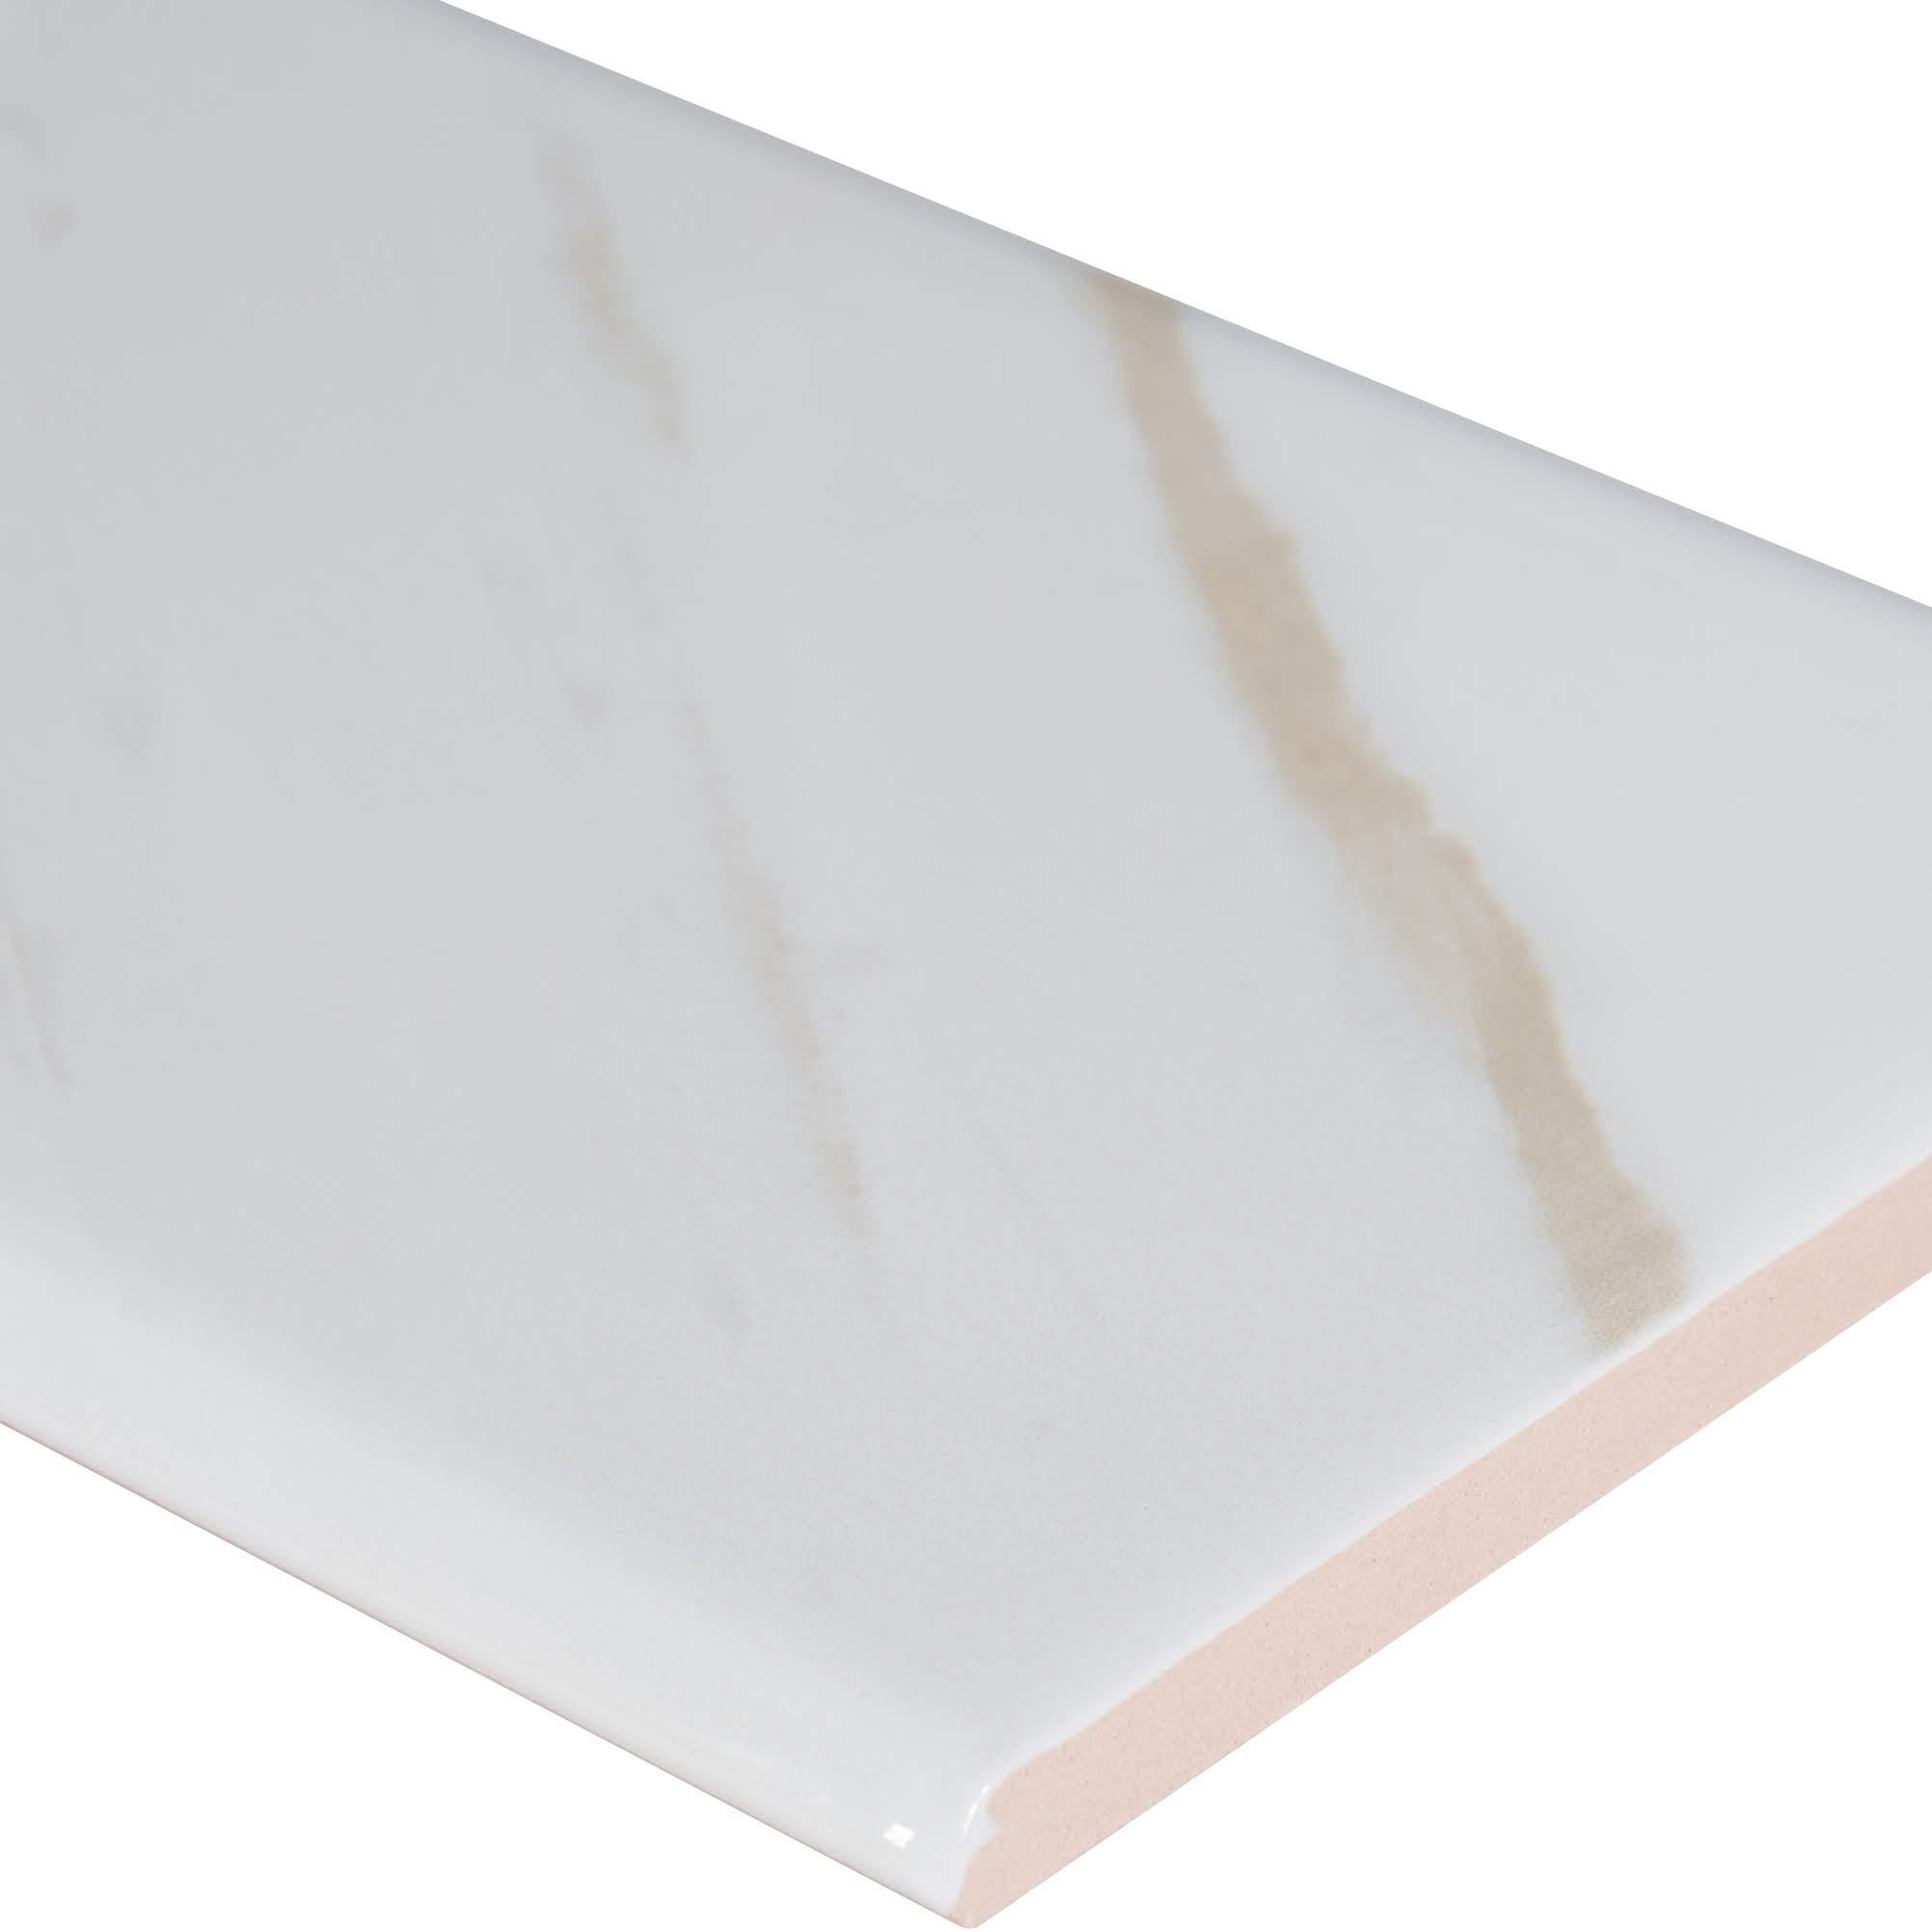 Classique White Calacatta Glossy 4x16 Bullnose